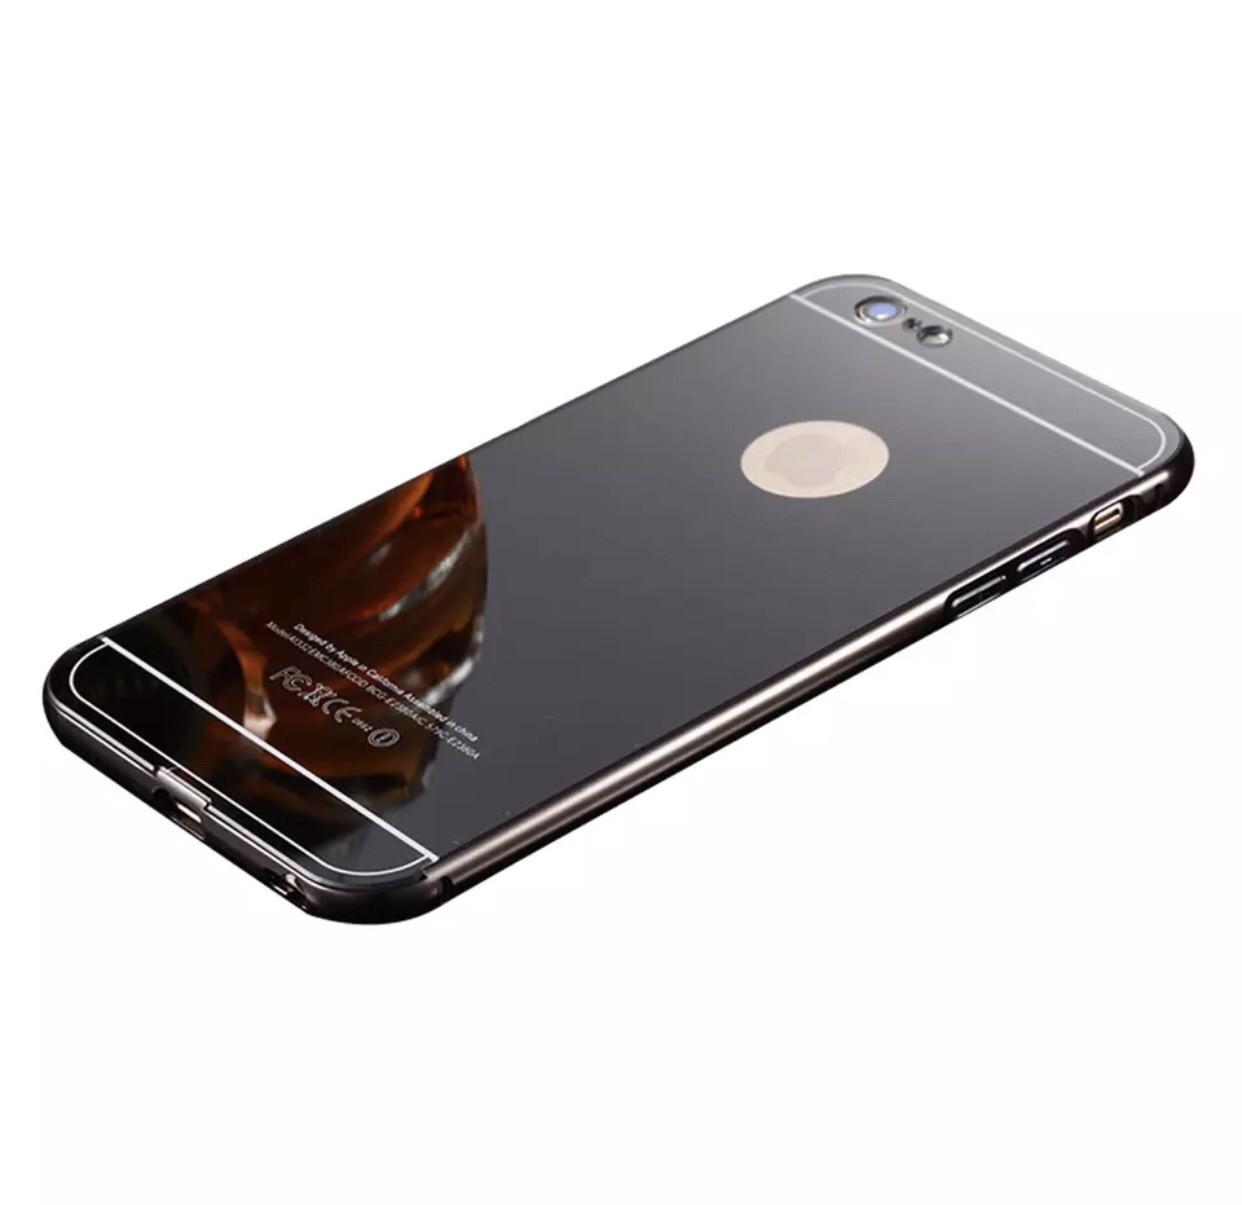 Чехол для Iphone 6 plus/6S plus зеркальный, black